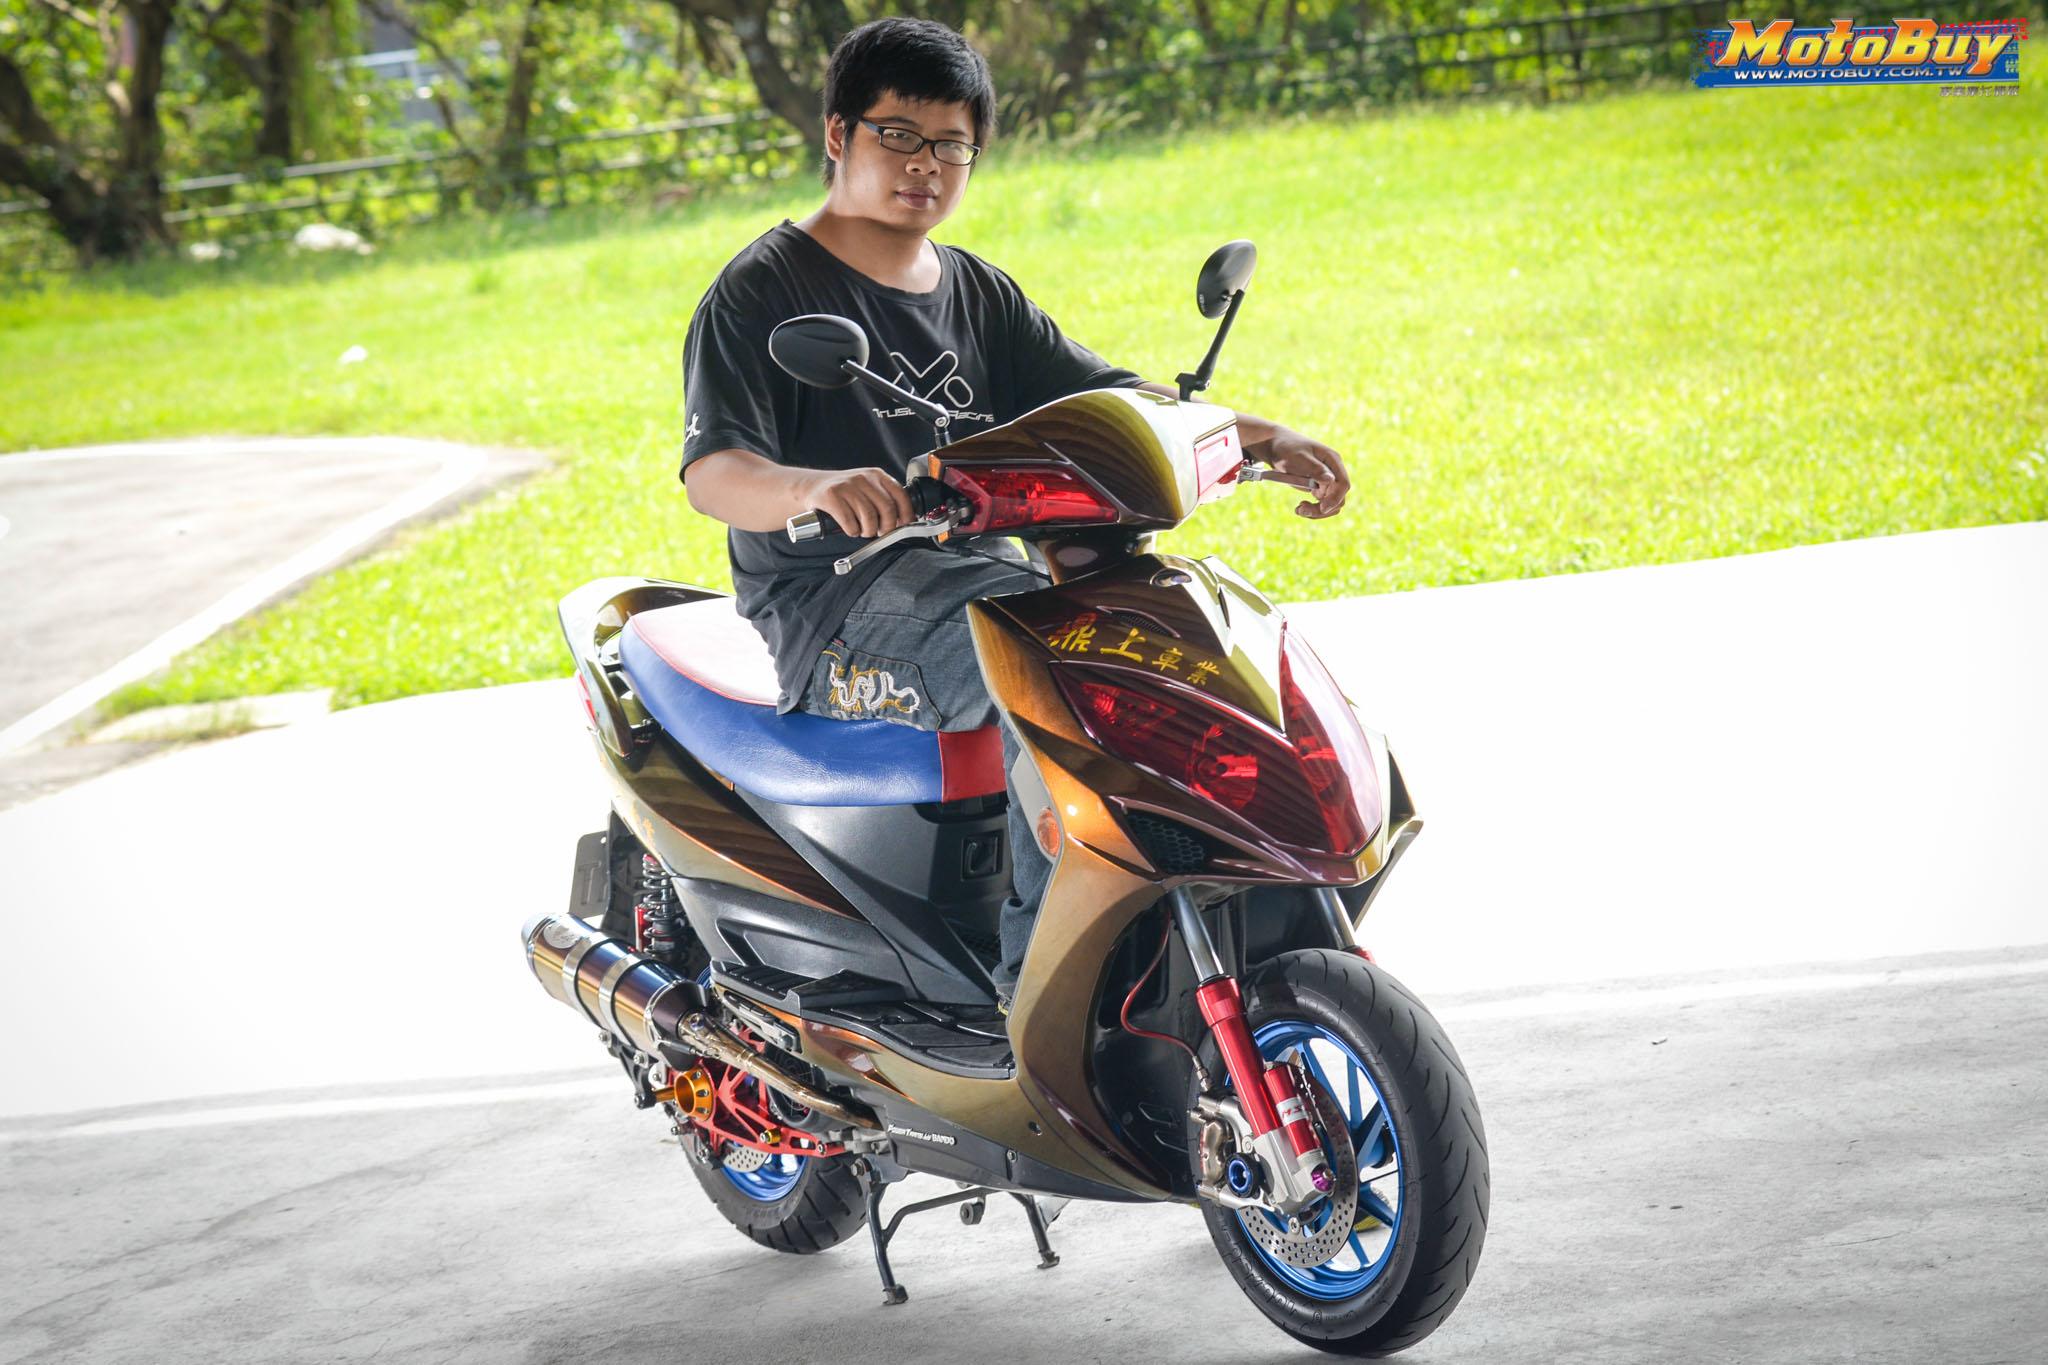 [夯車分享] 幻彩雷霆 KYMCO RACING 150   MotoBuy